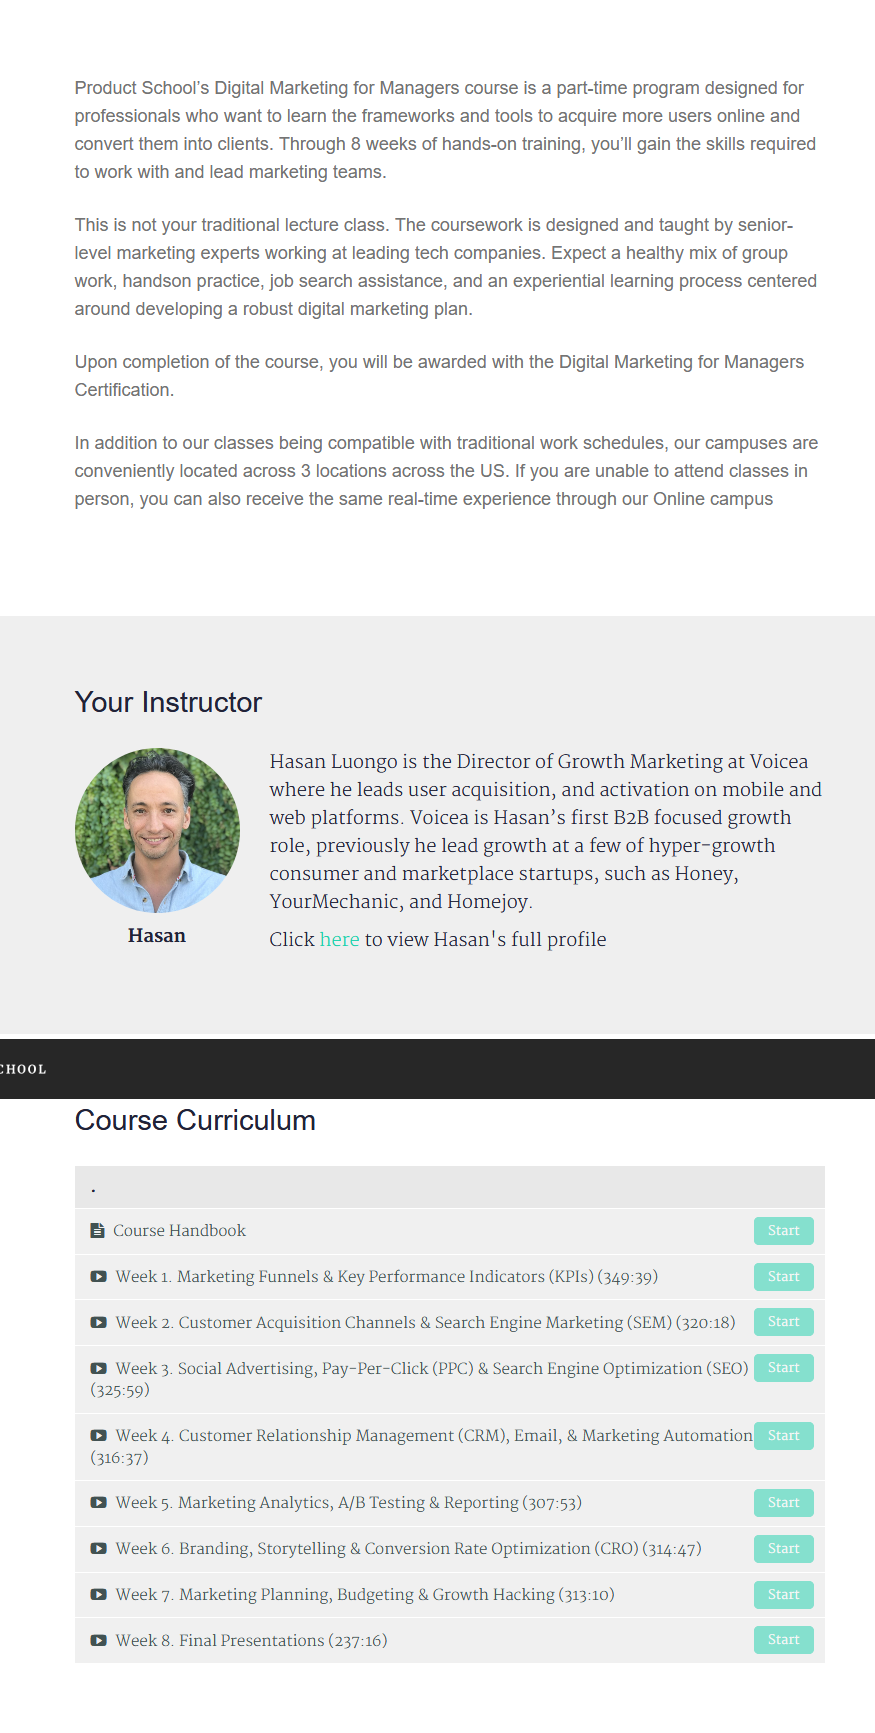 Hasan Luongo - Product Marketing Course